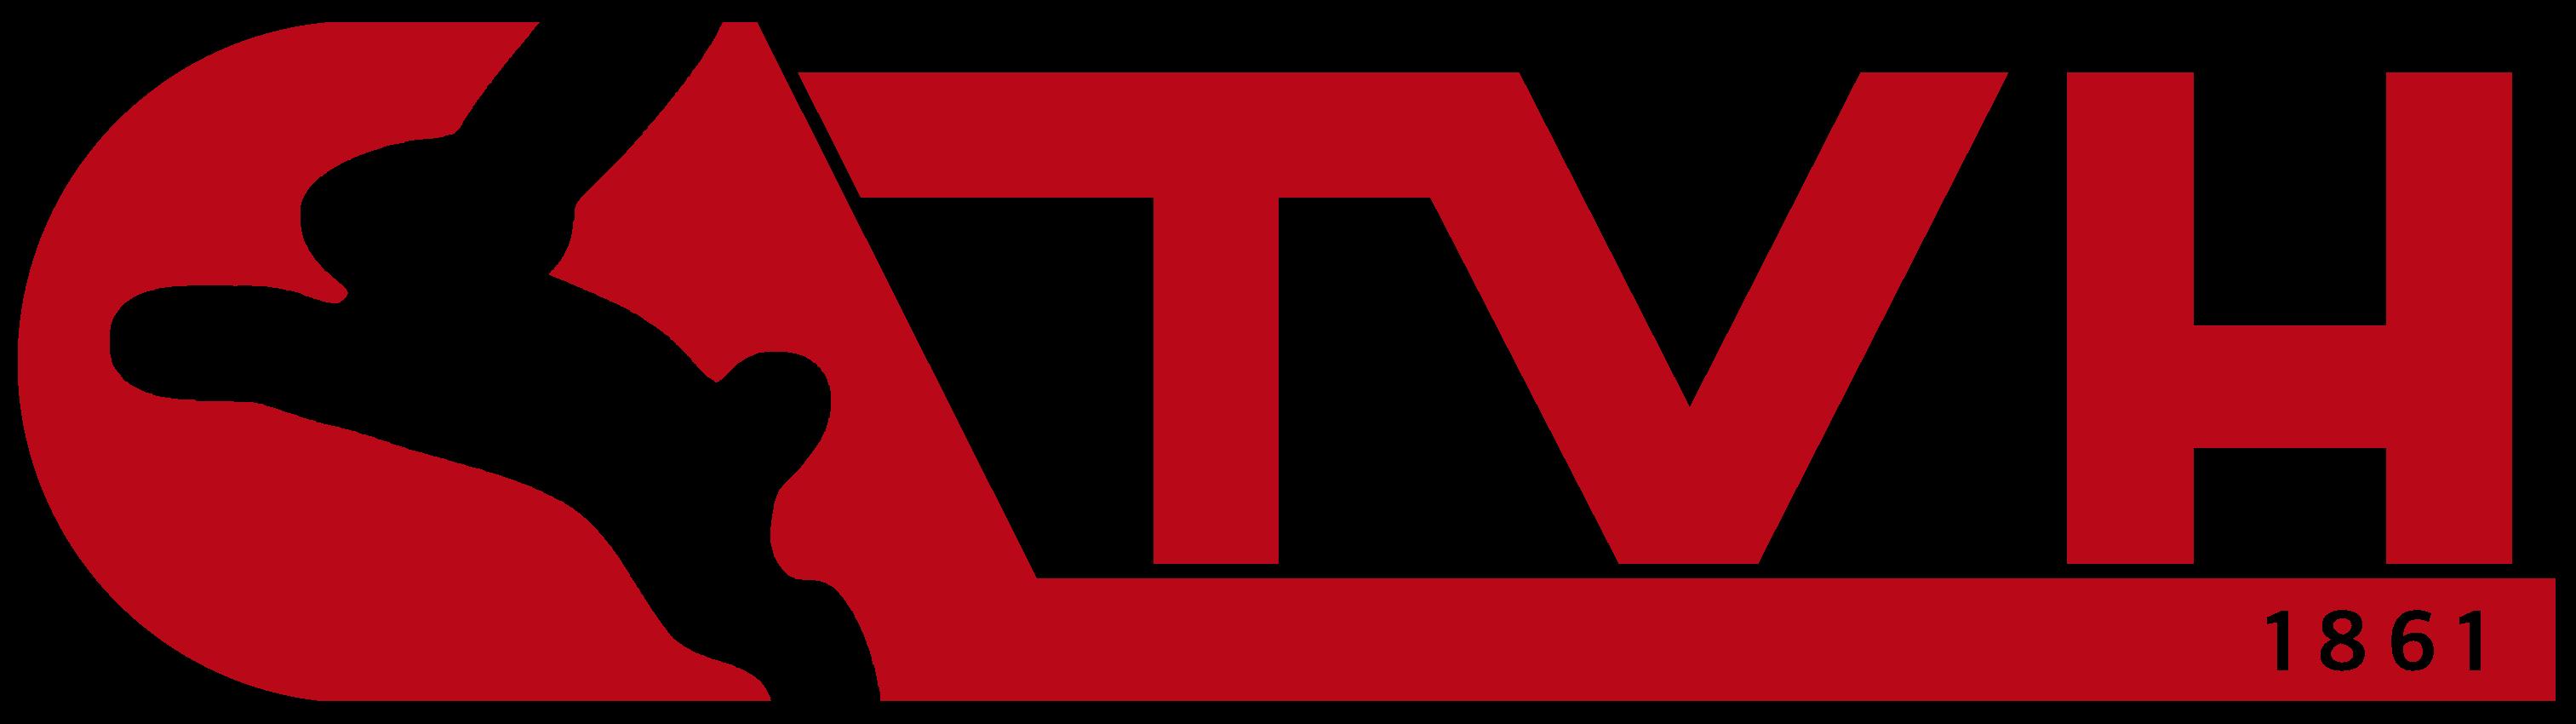 TV Haßfurt 1861